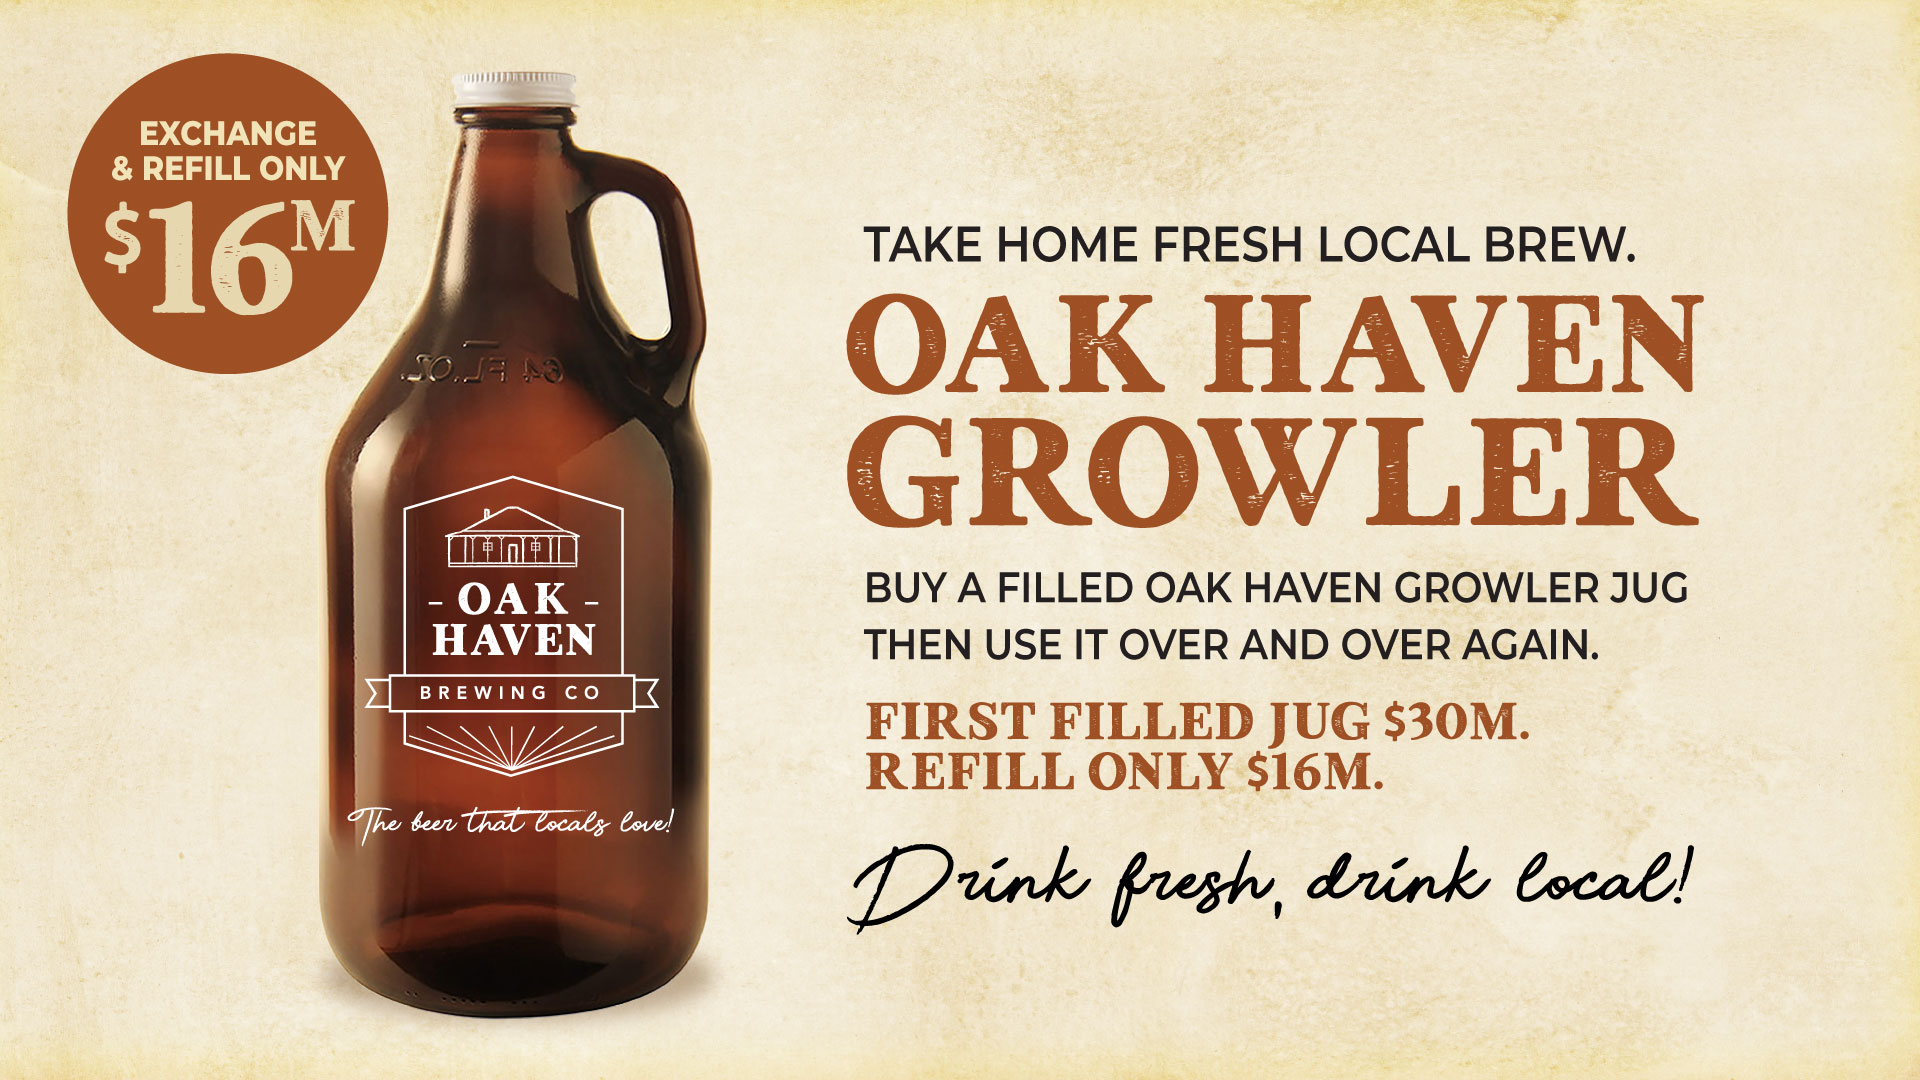 oak haven growler